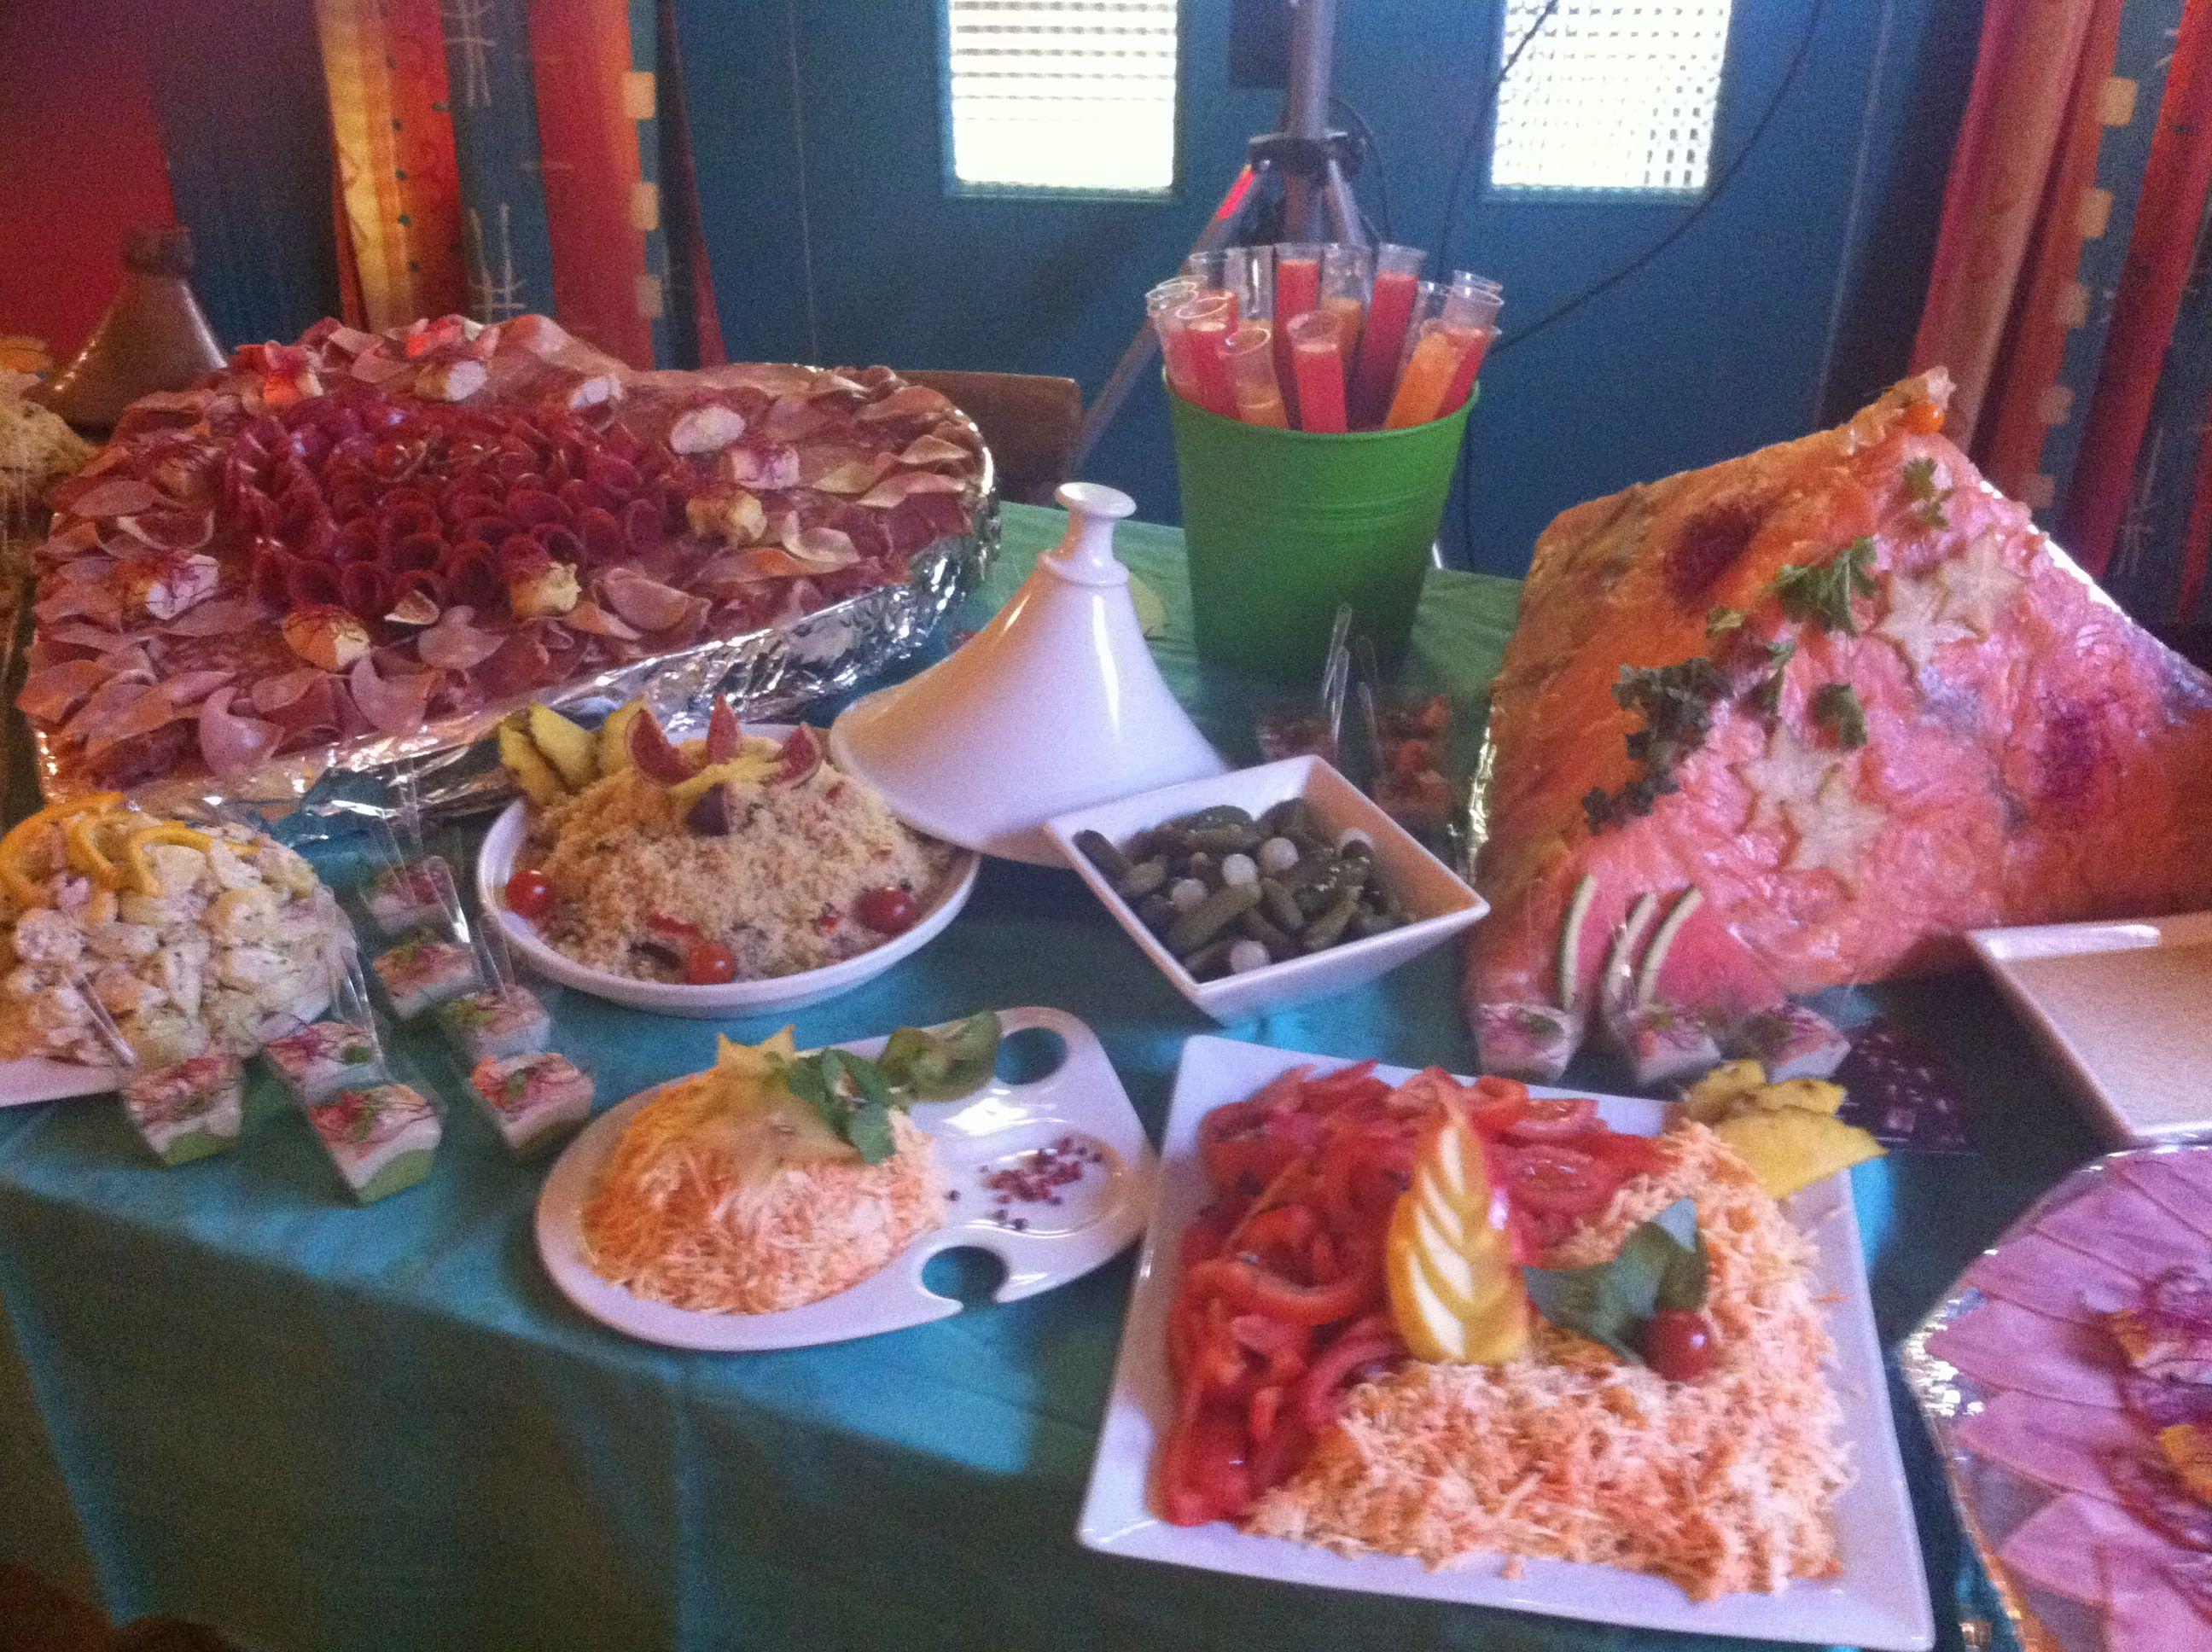 Buffet froid compos par taboul salade de riz salade de tomates salade pi montaise - Idee plancha party ...